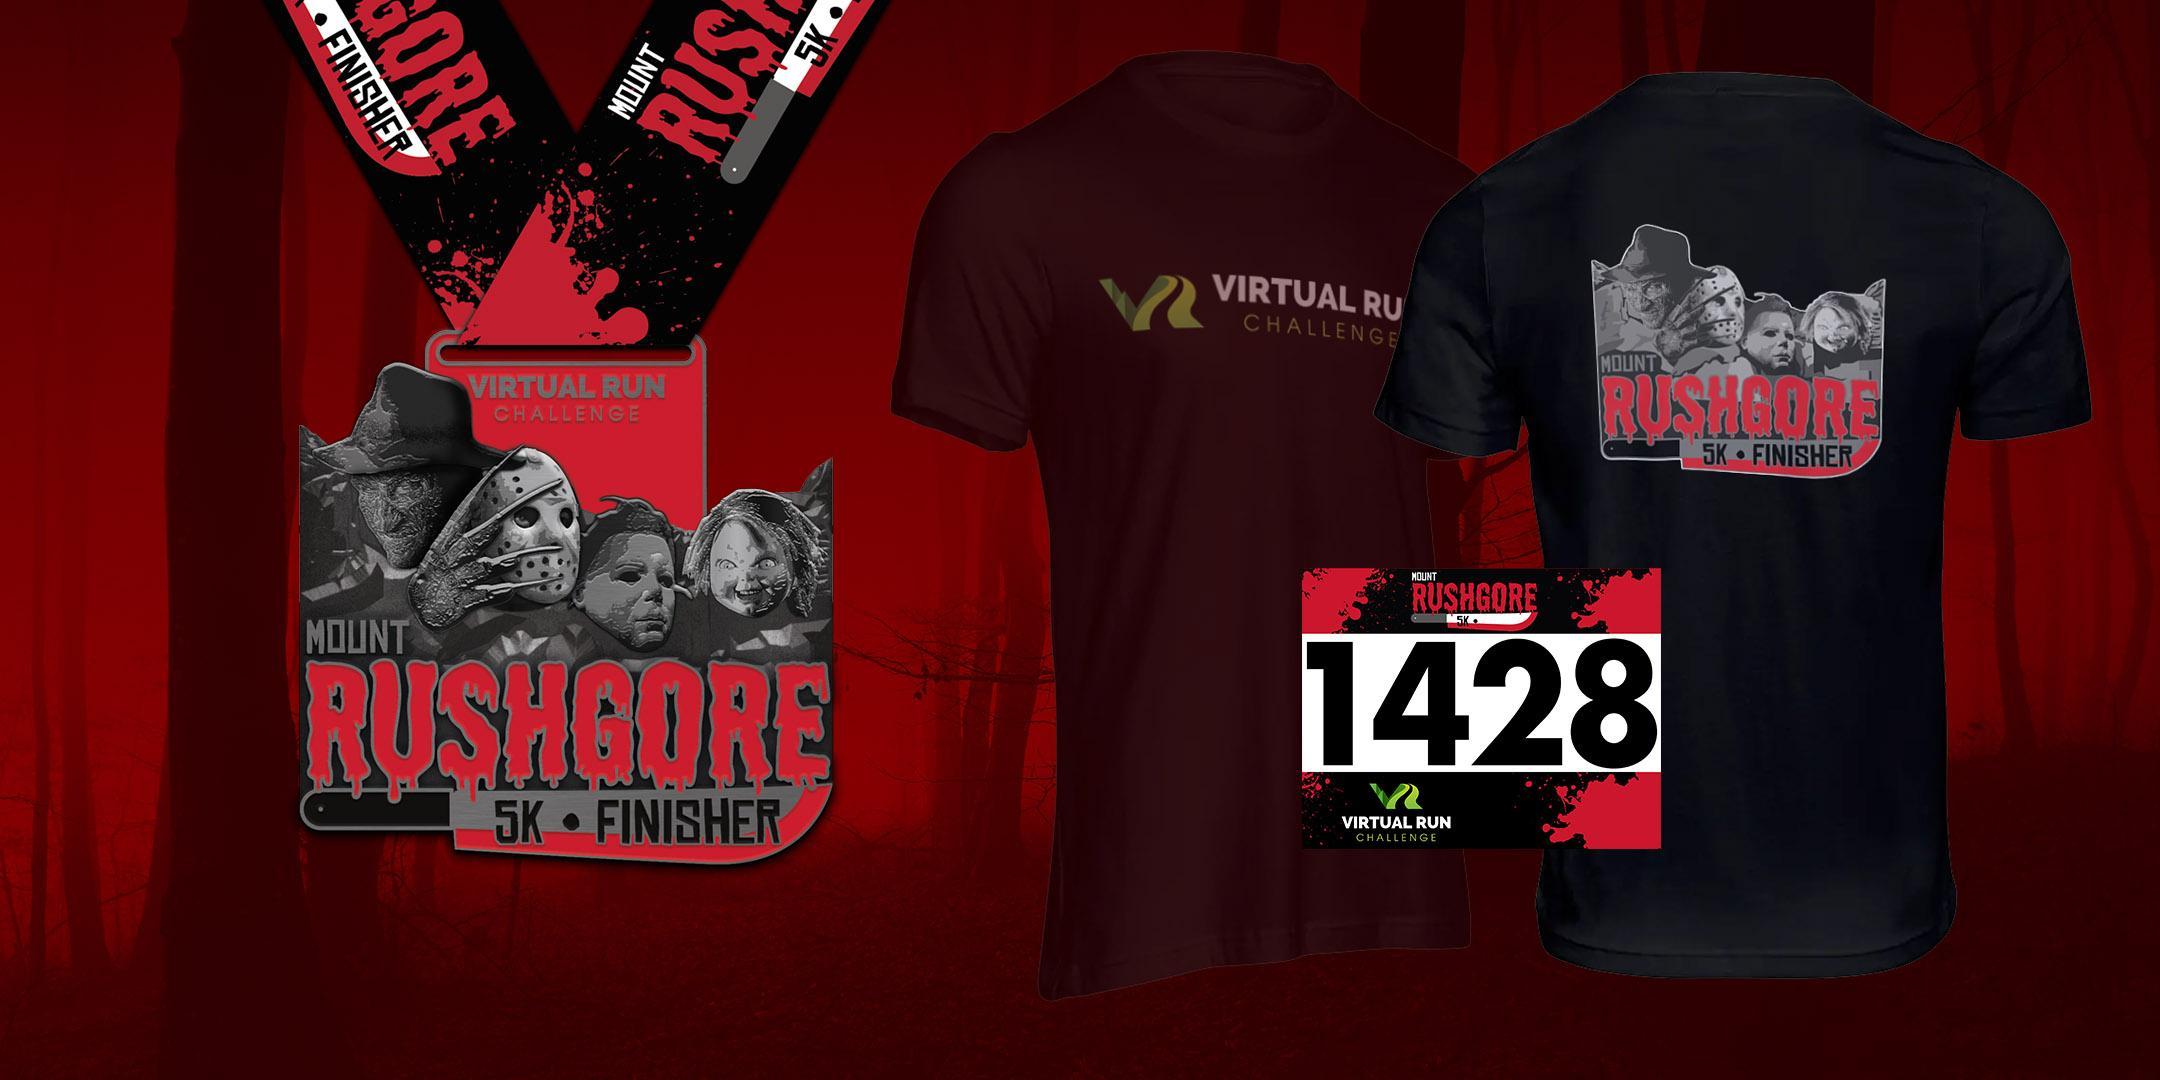 Halloween 2020 Waco 2020   Mount RushGore Virtual 5k Halloween Run   Waco   1 OCT 2020